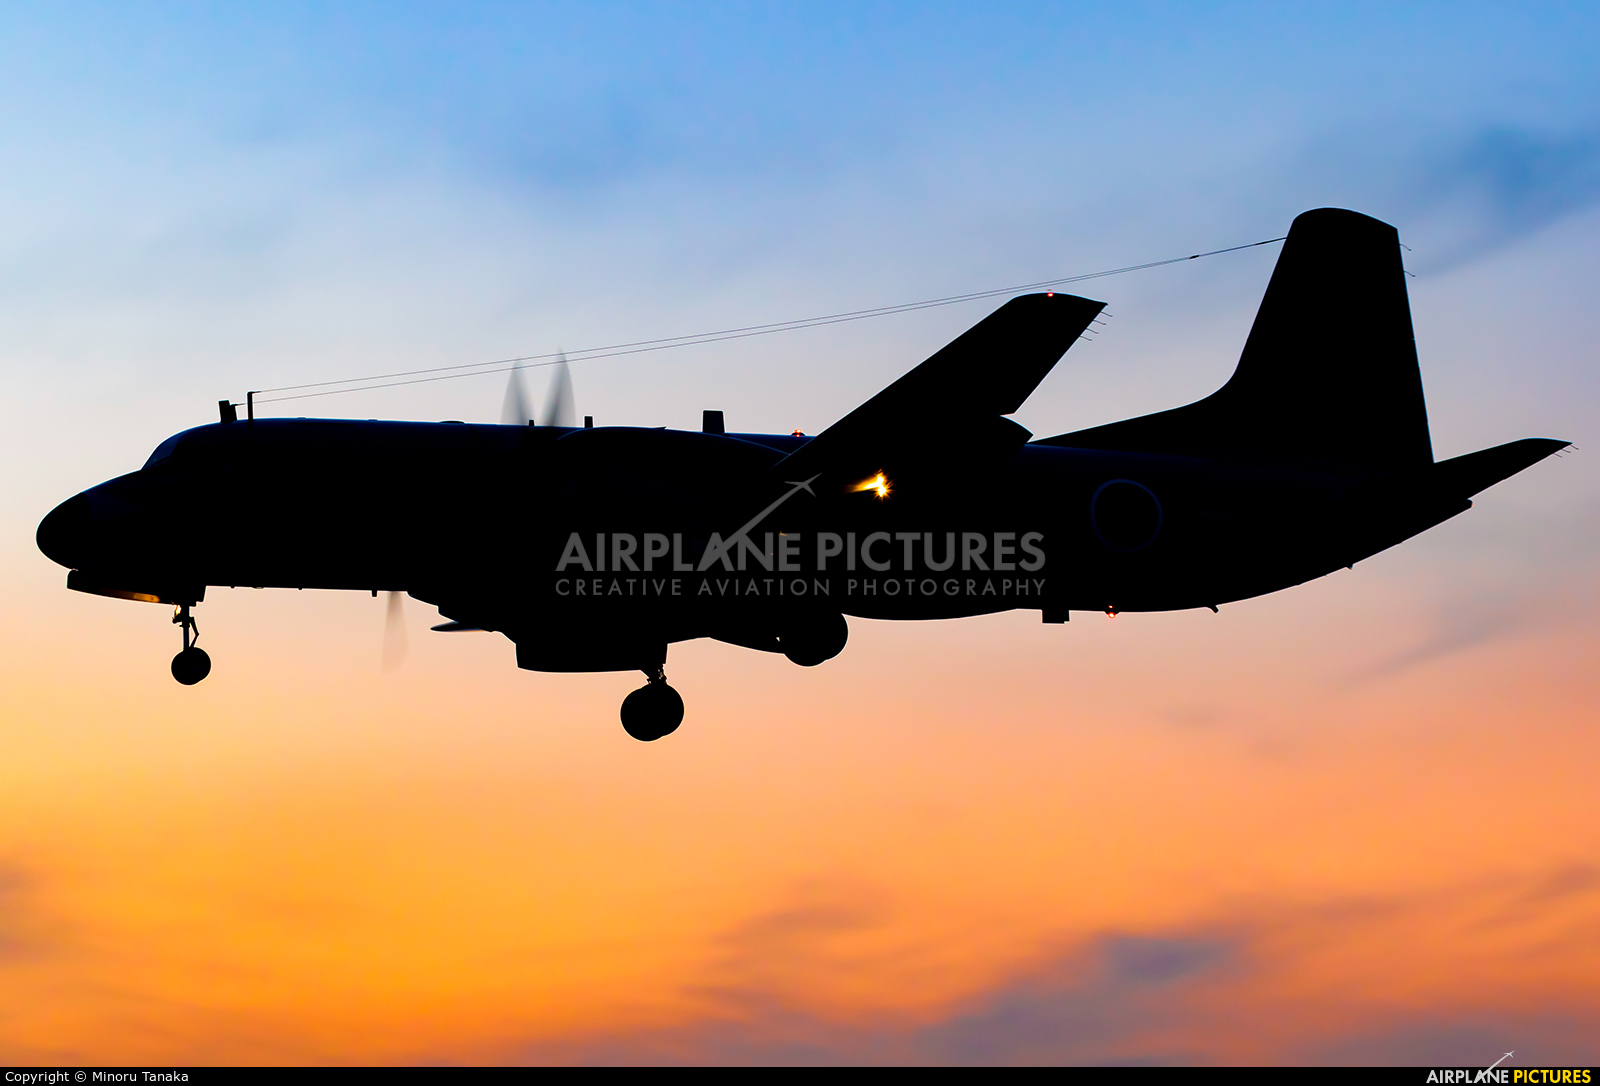 Japan - Air Self Defence Force 12-1162 aircraft at Iruma AB